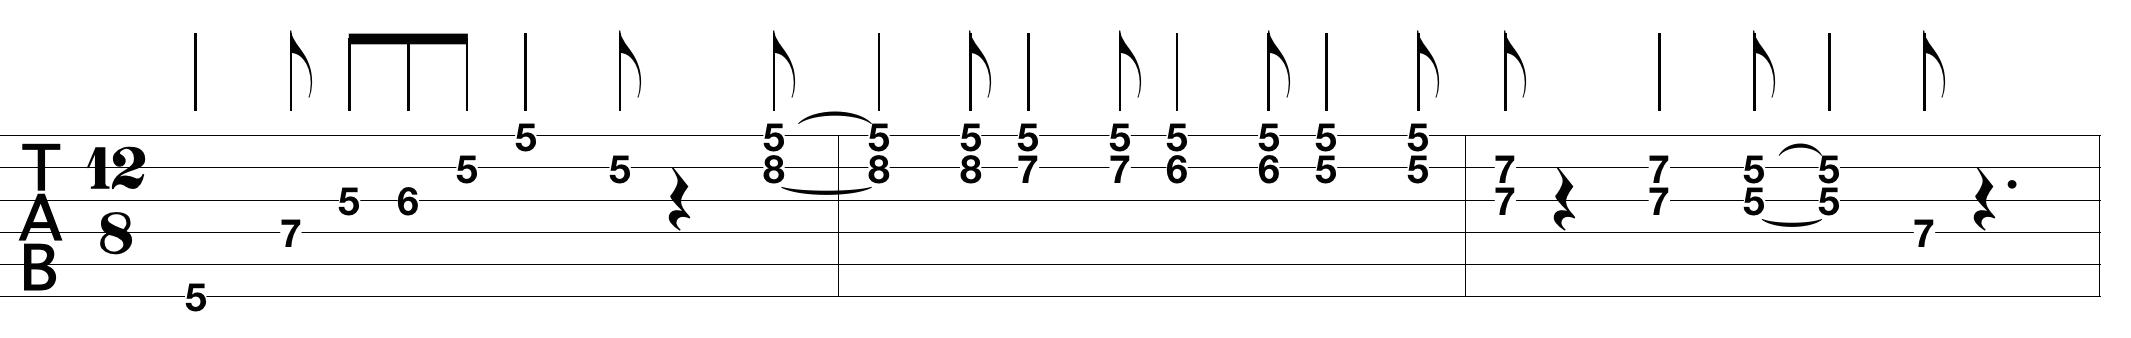 online-blues-guitar-lessons_1.png